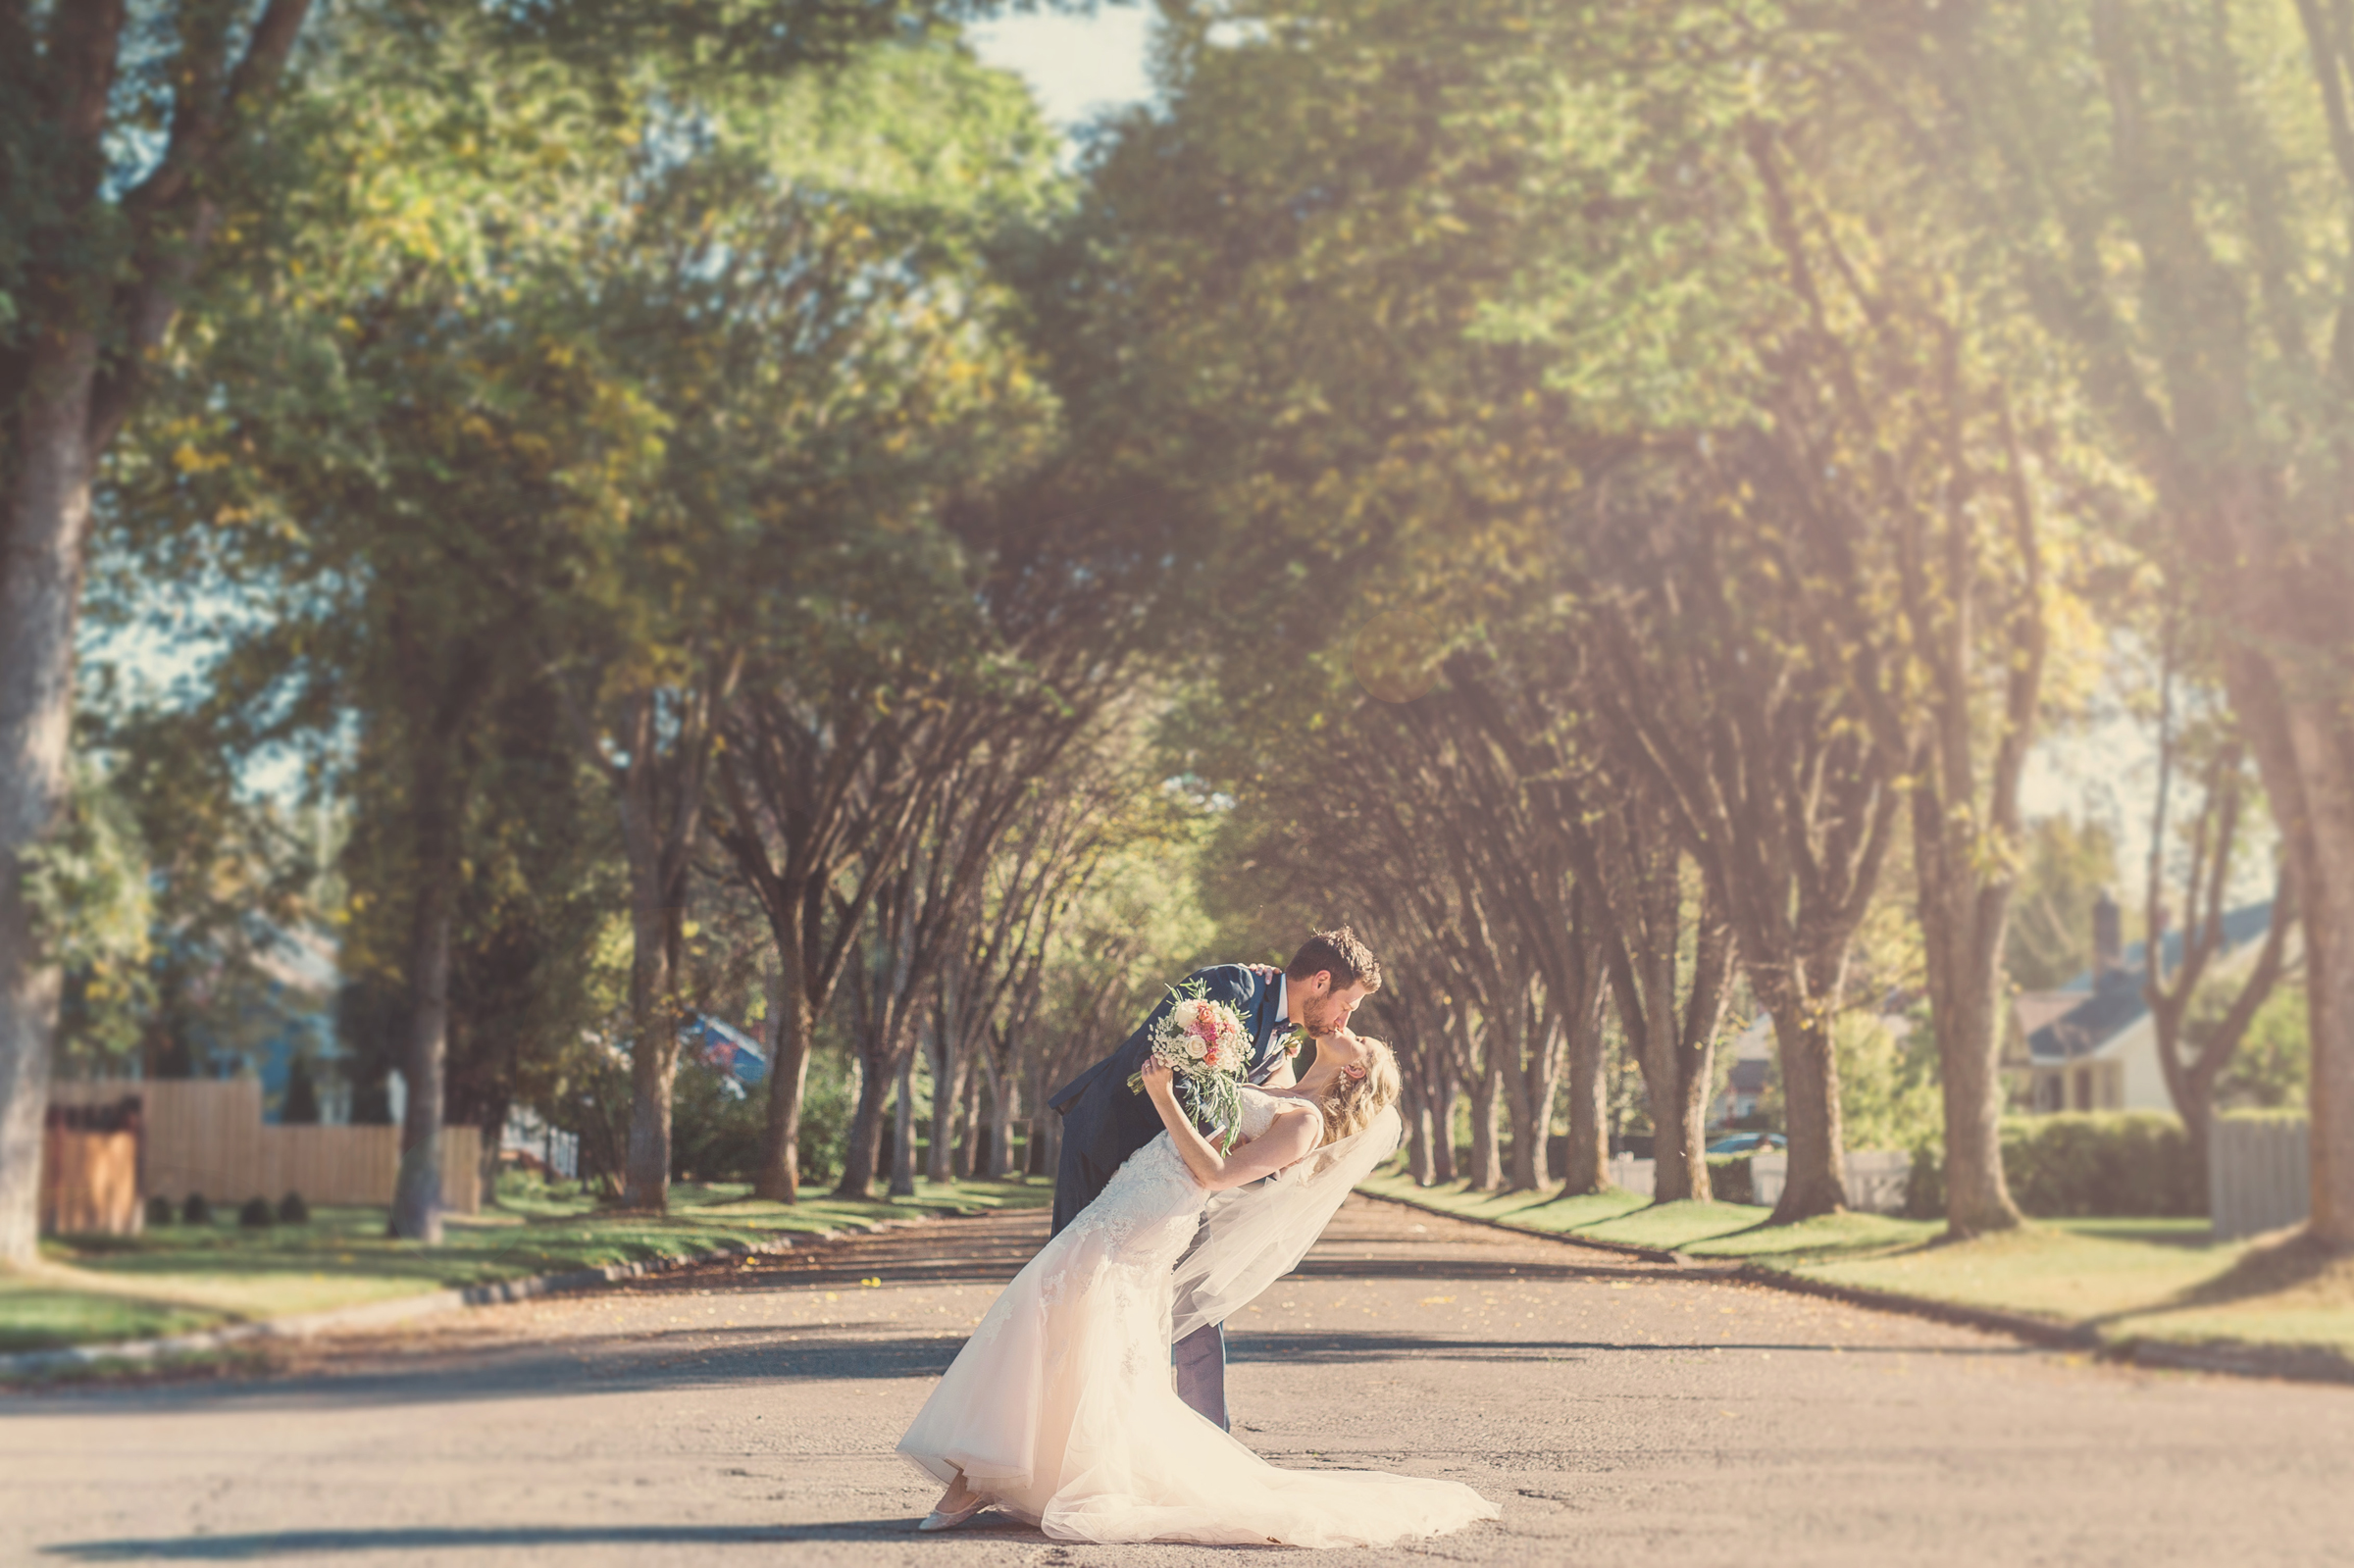 IMG_1542-VANCOUVER-WEDDING-PHOTOGRAPHER-JENNIFER-PICARD-PHOTOGRAPHY.jpg